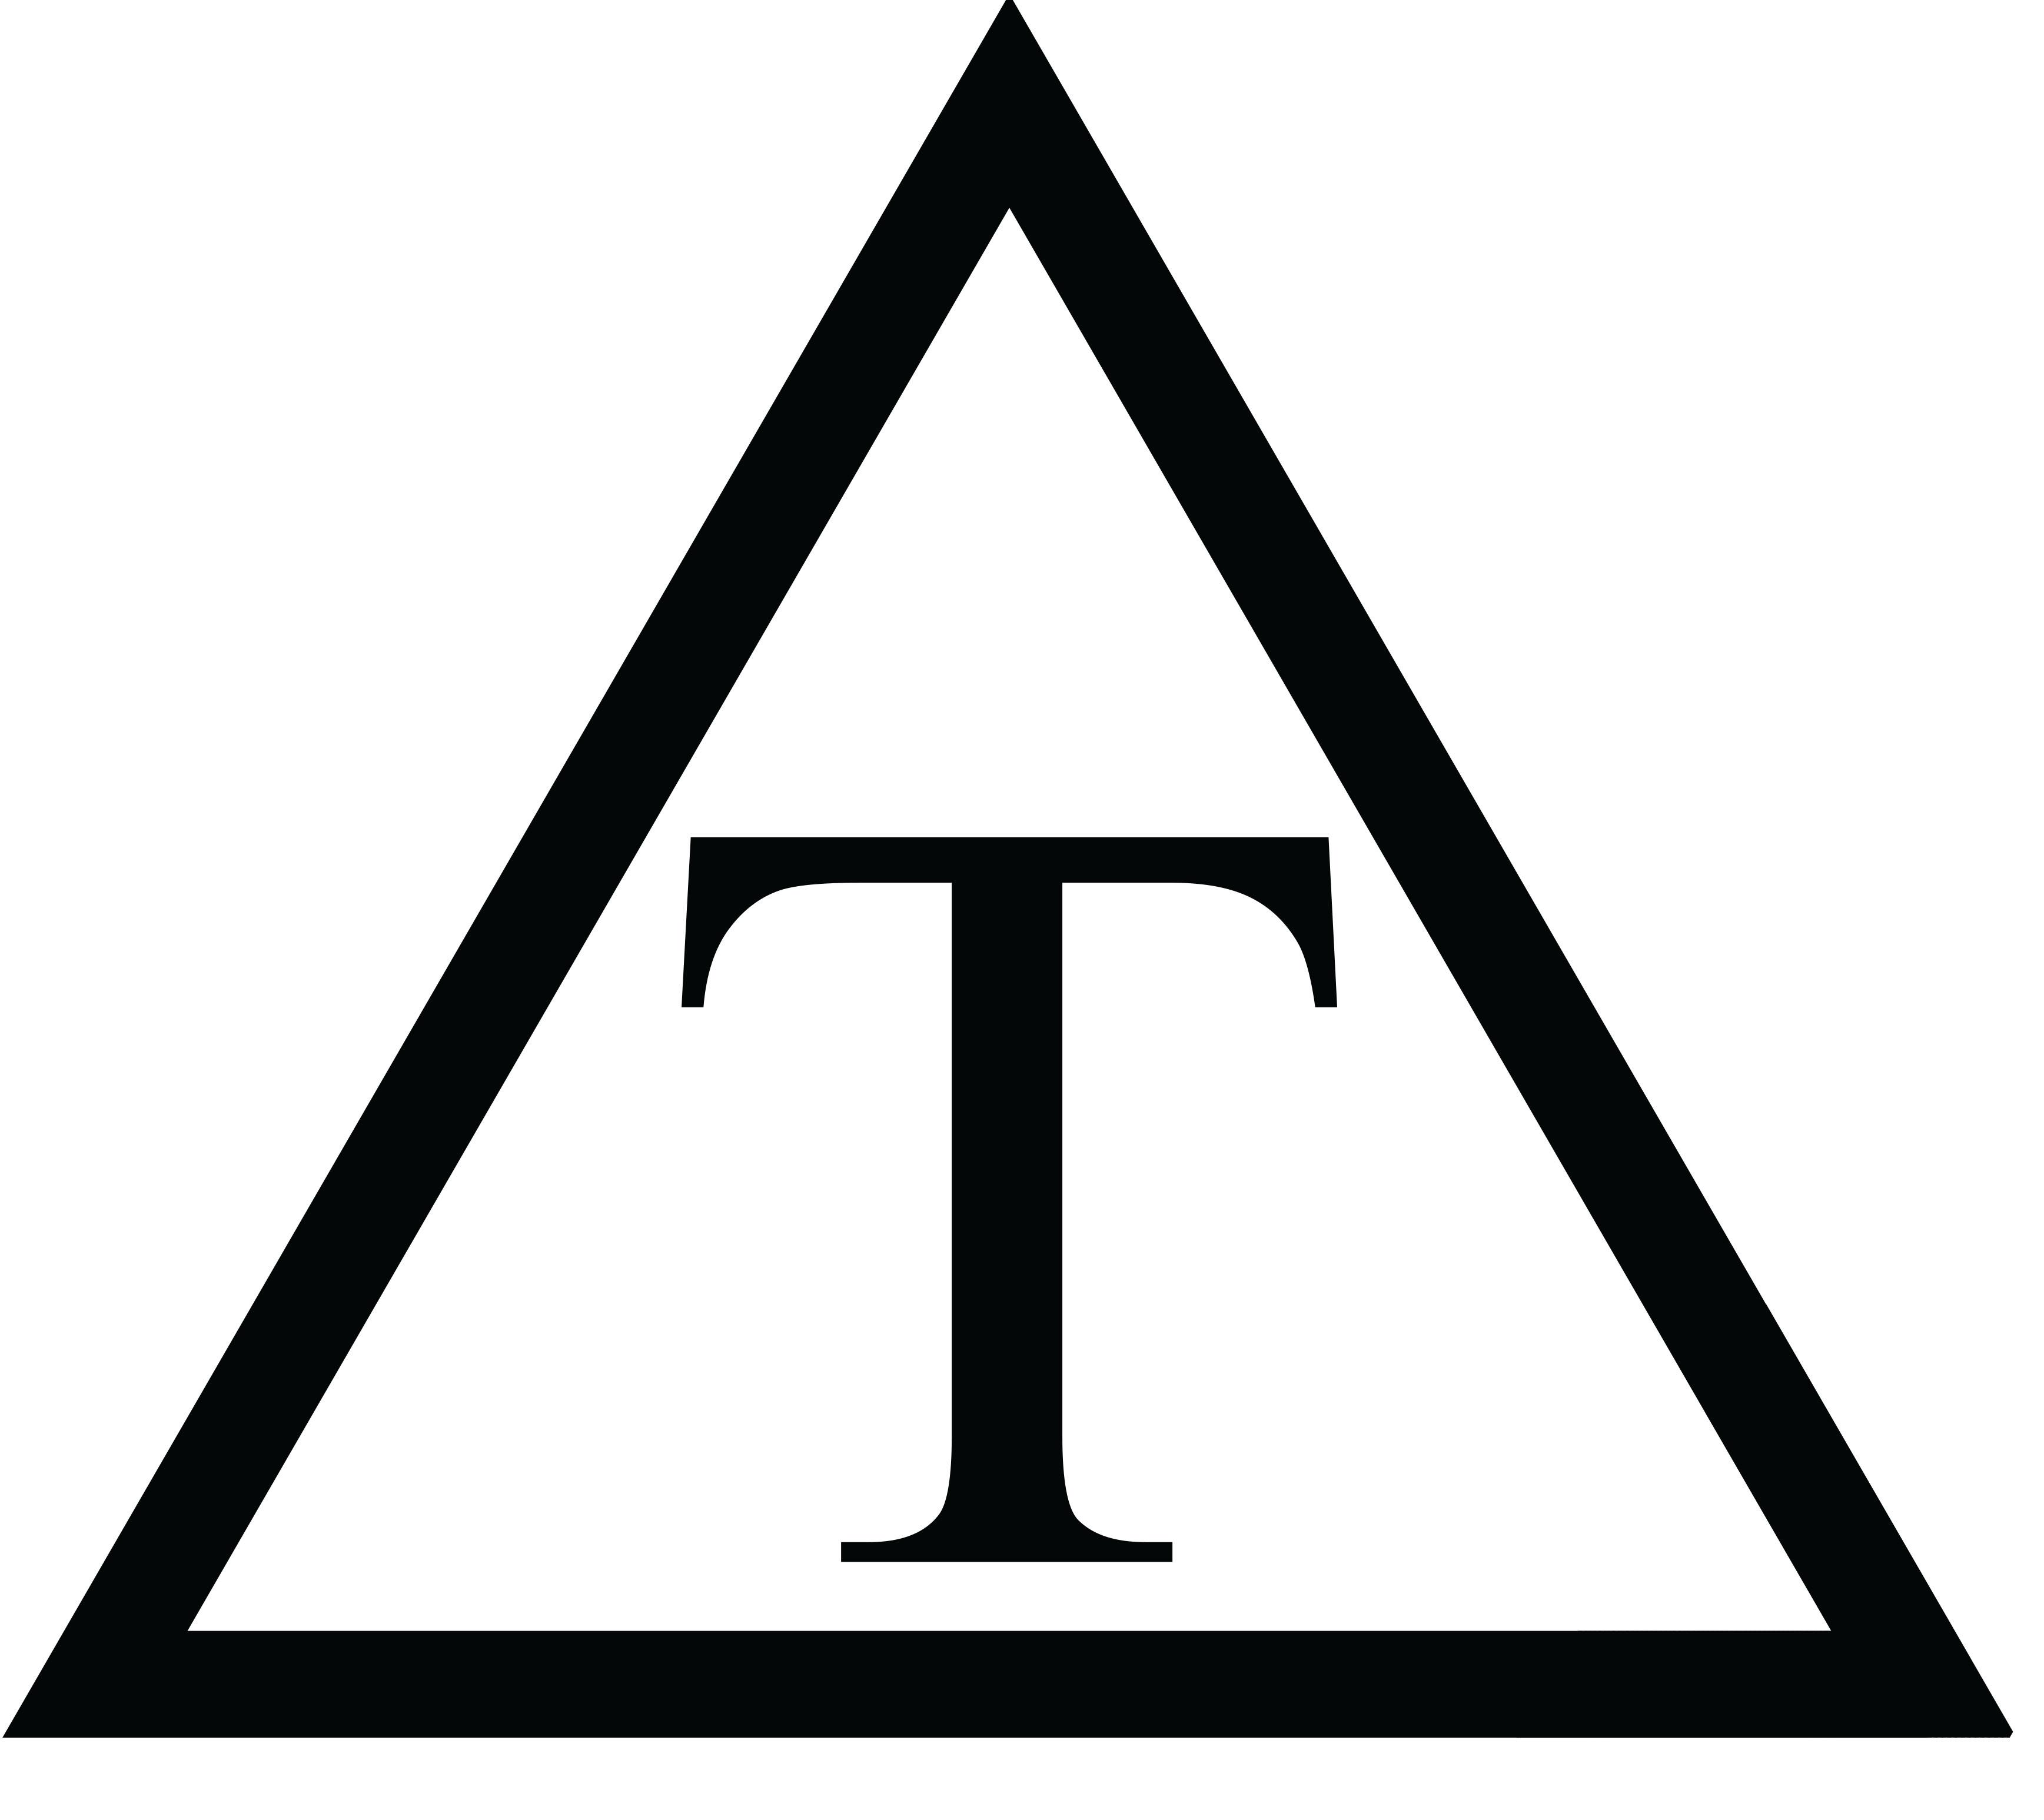 Uk Triangle Fraternity